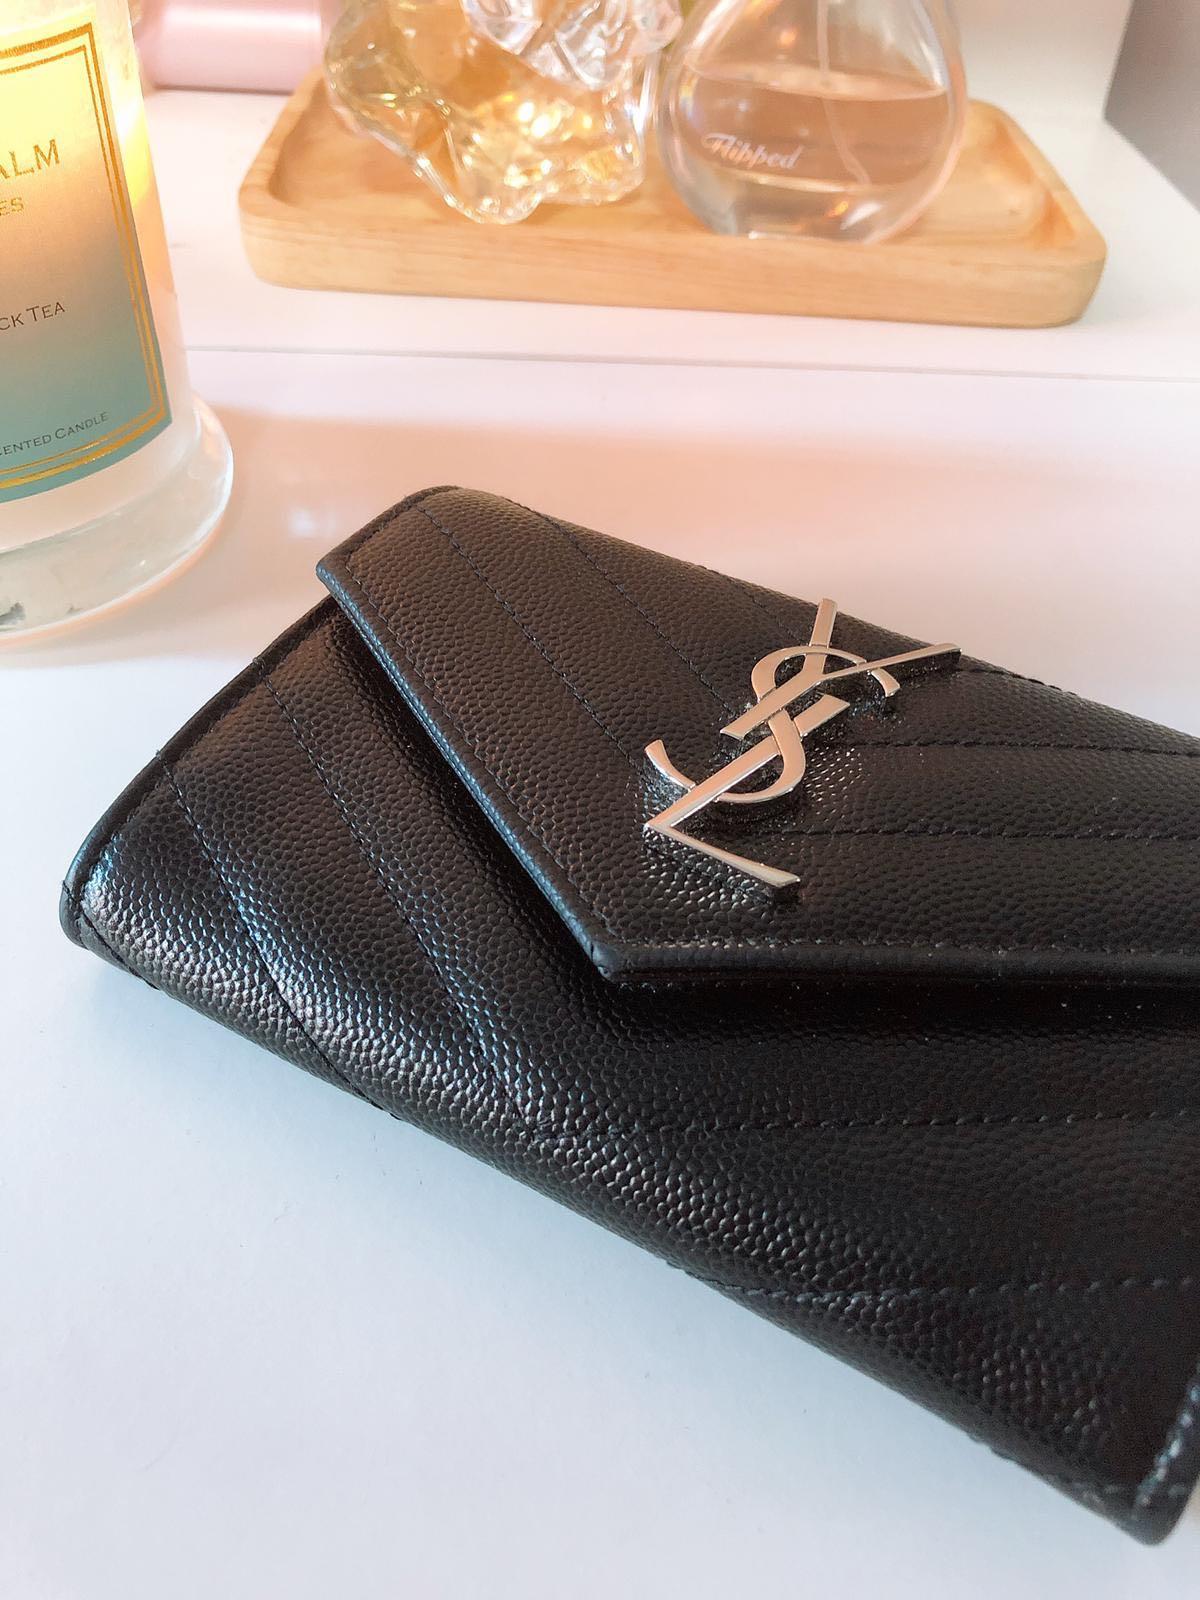 0e0cbca4fa0 YSL Small Monogram Envelope Wallet, Women's Fashion, Bags & Wallets, Wallets  on Carousell